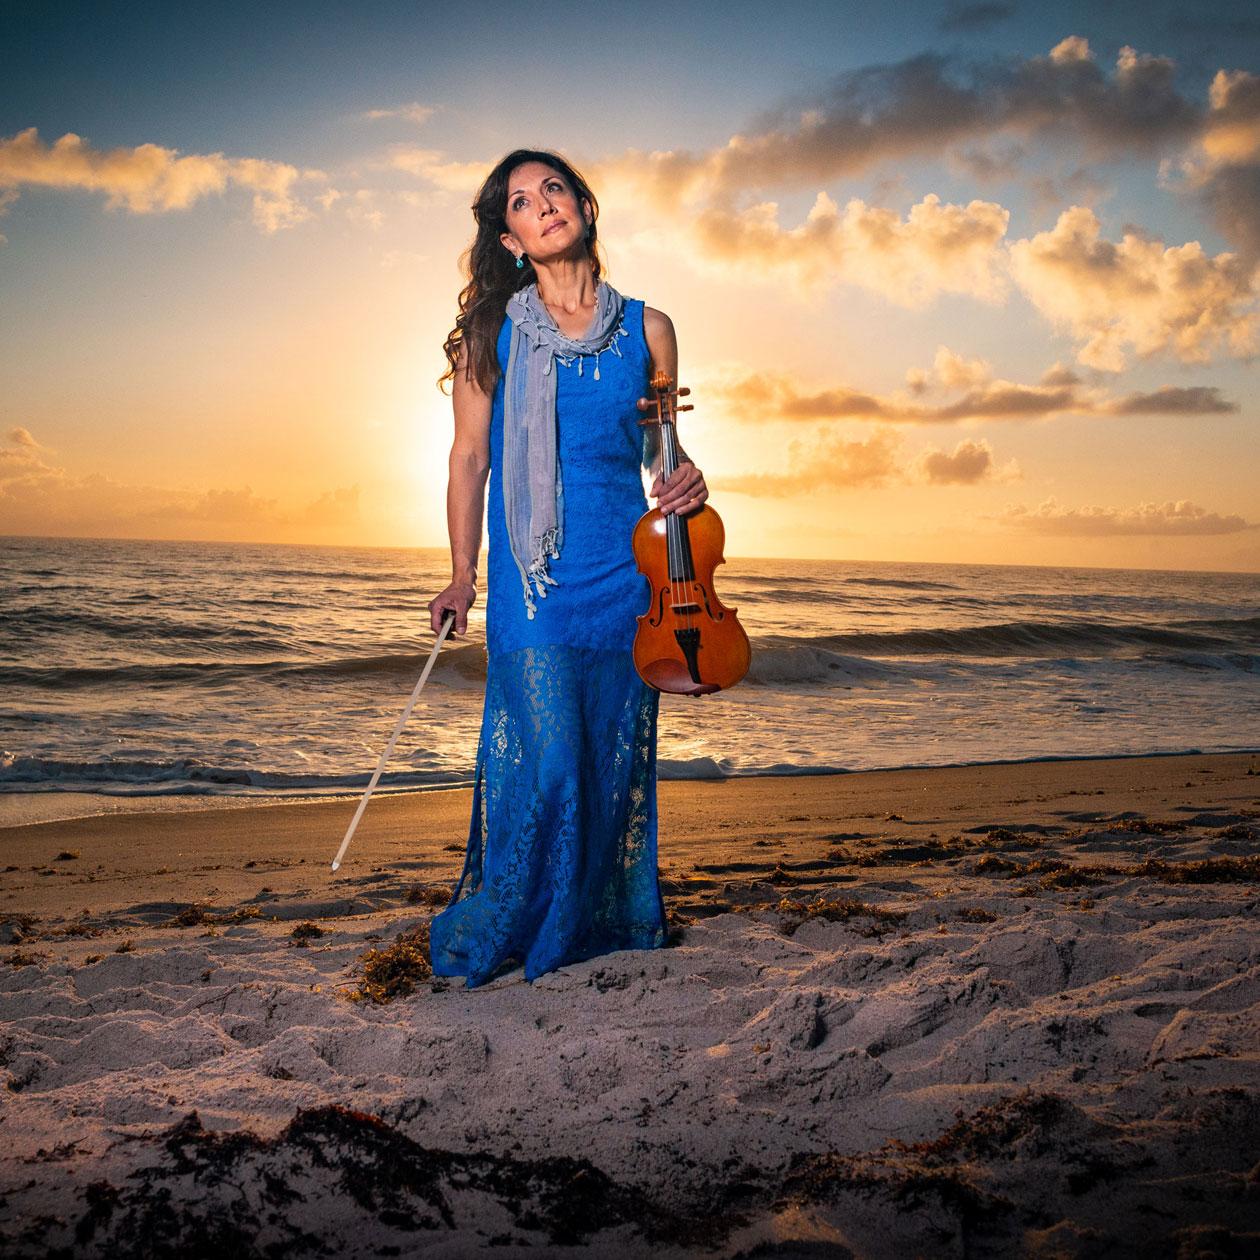 Mariana Sunset Violinist #2